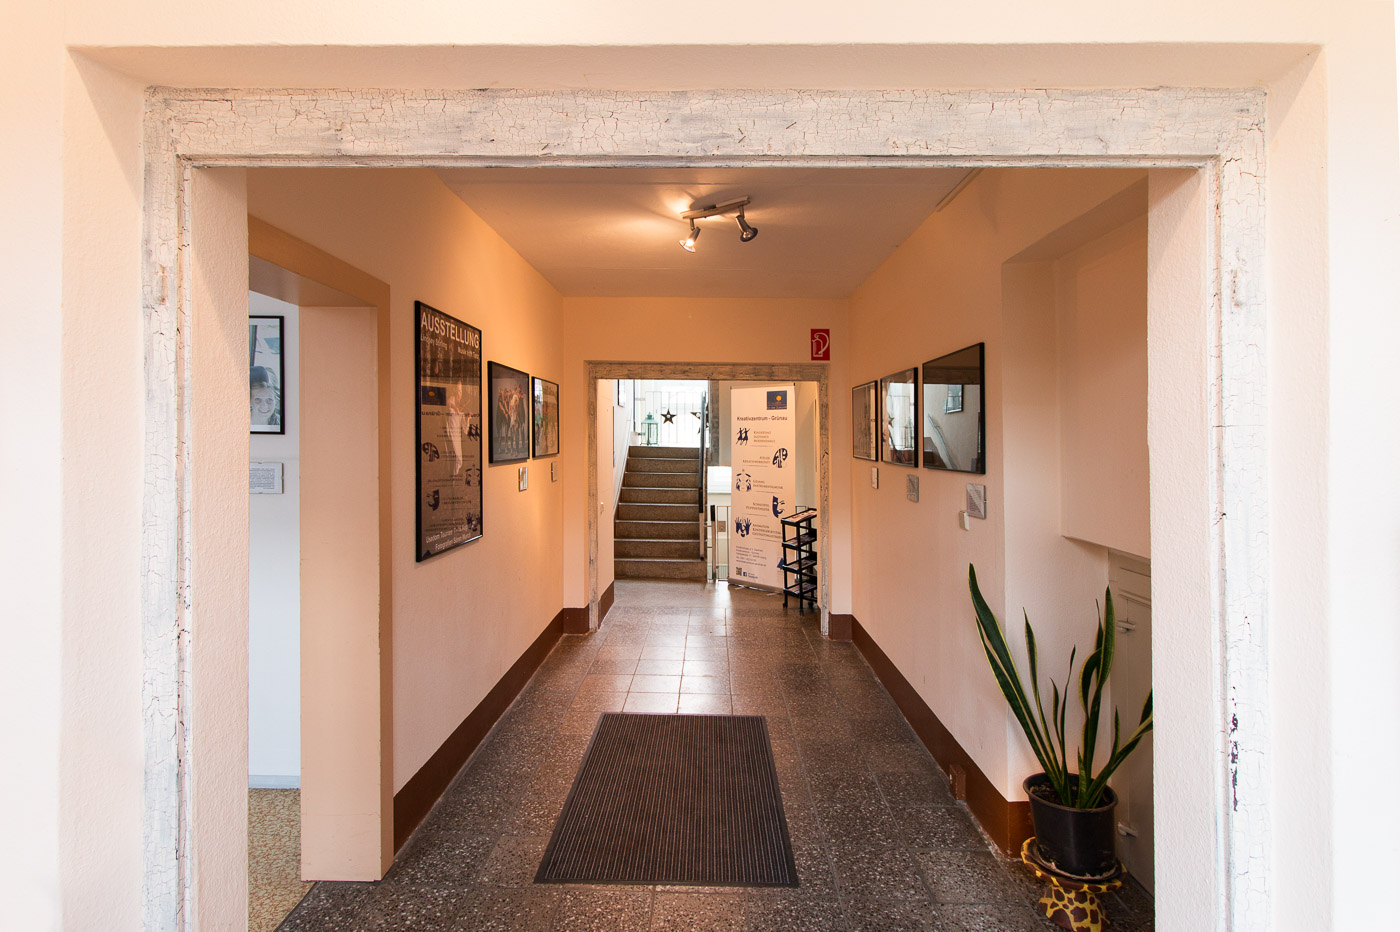 Eingang und Treppenaufgang